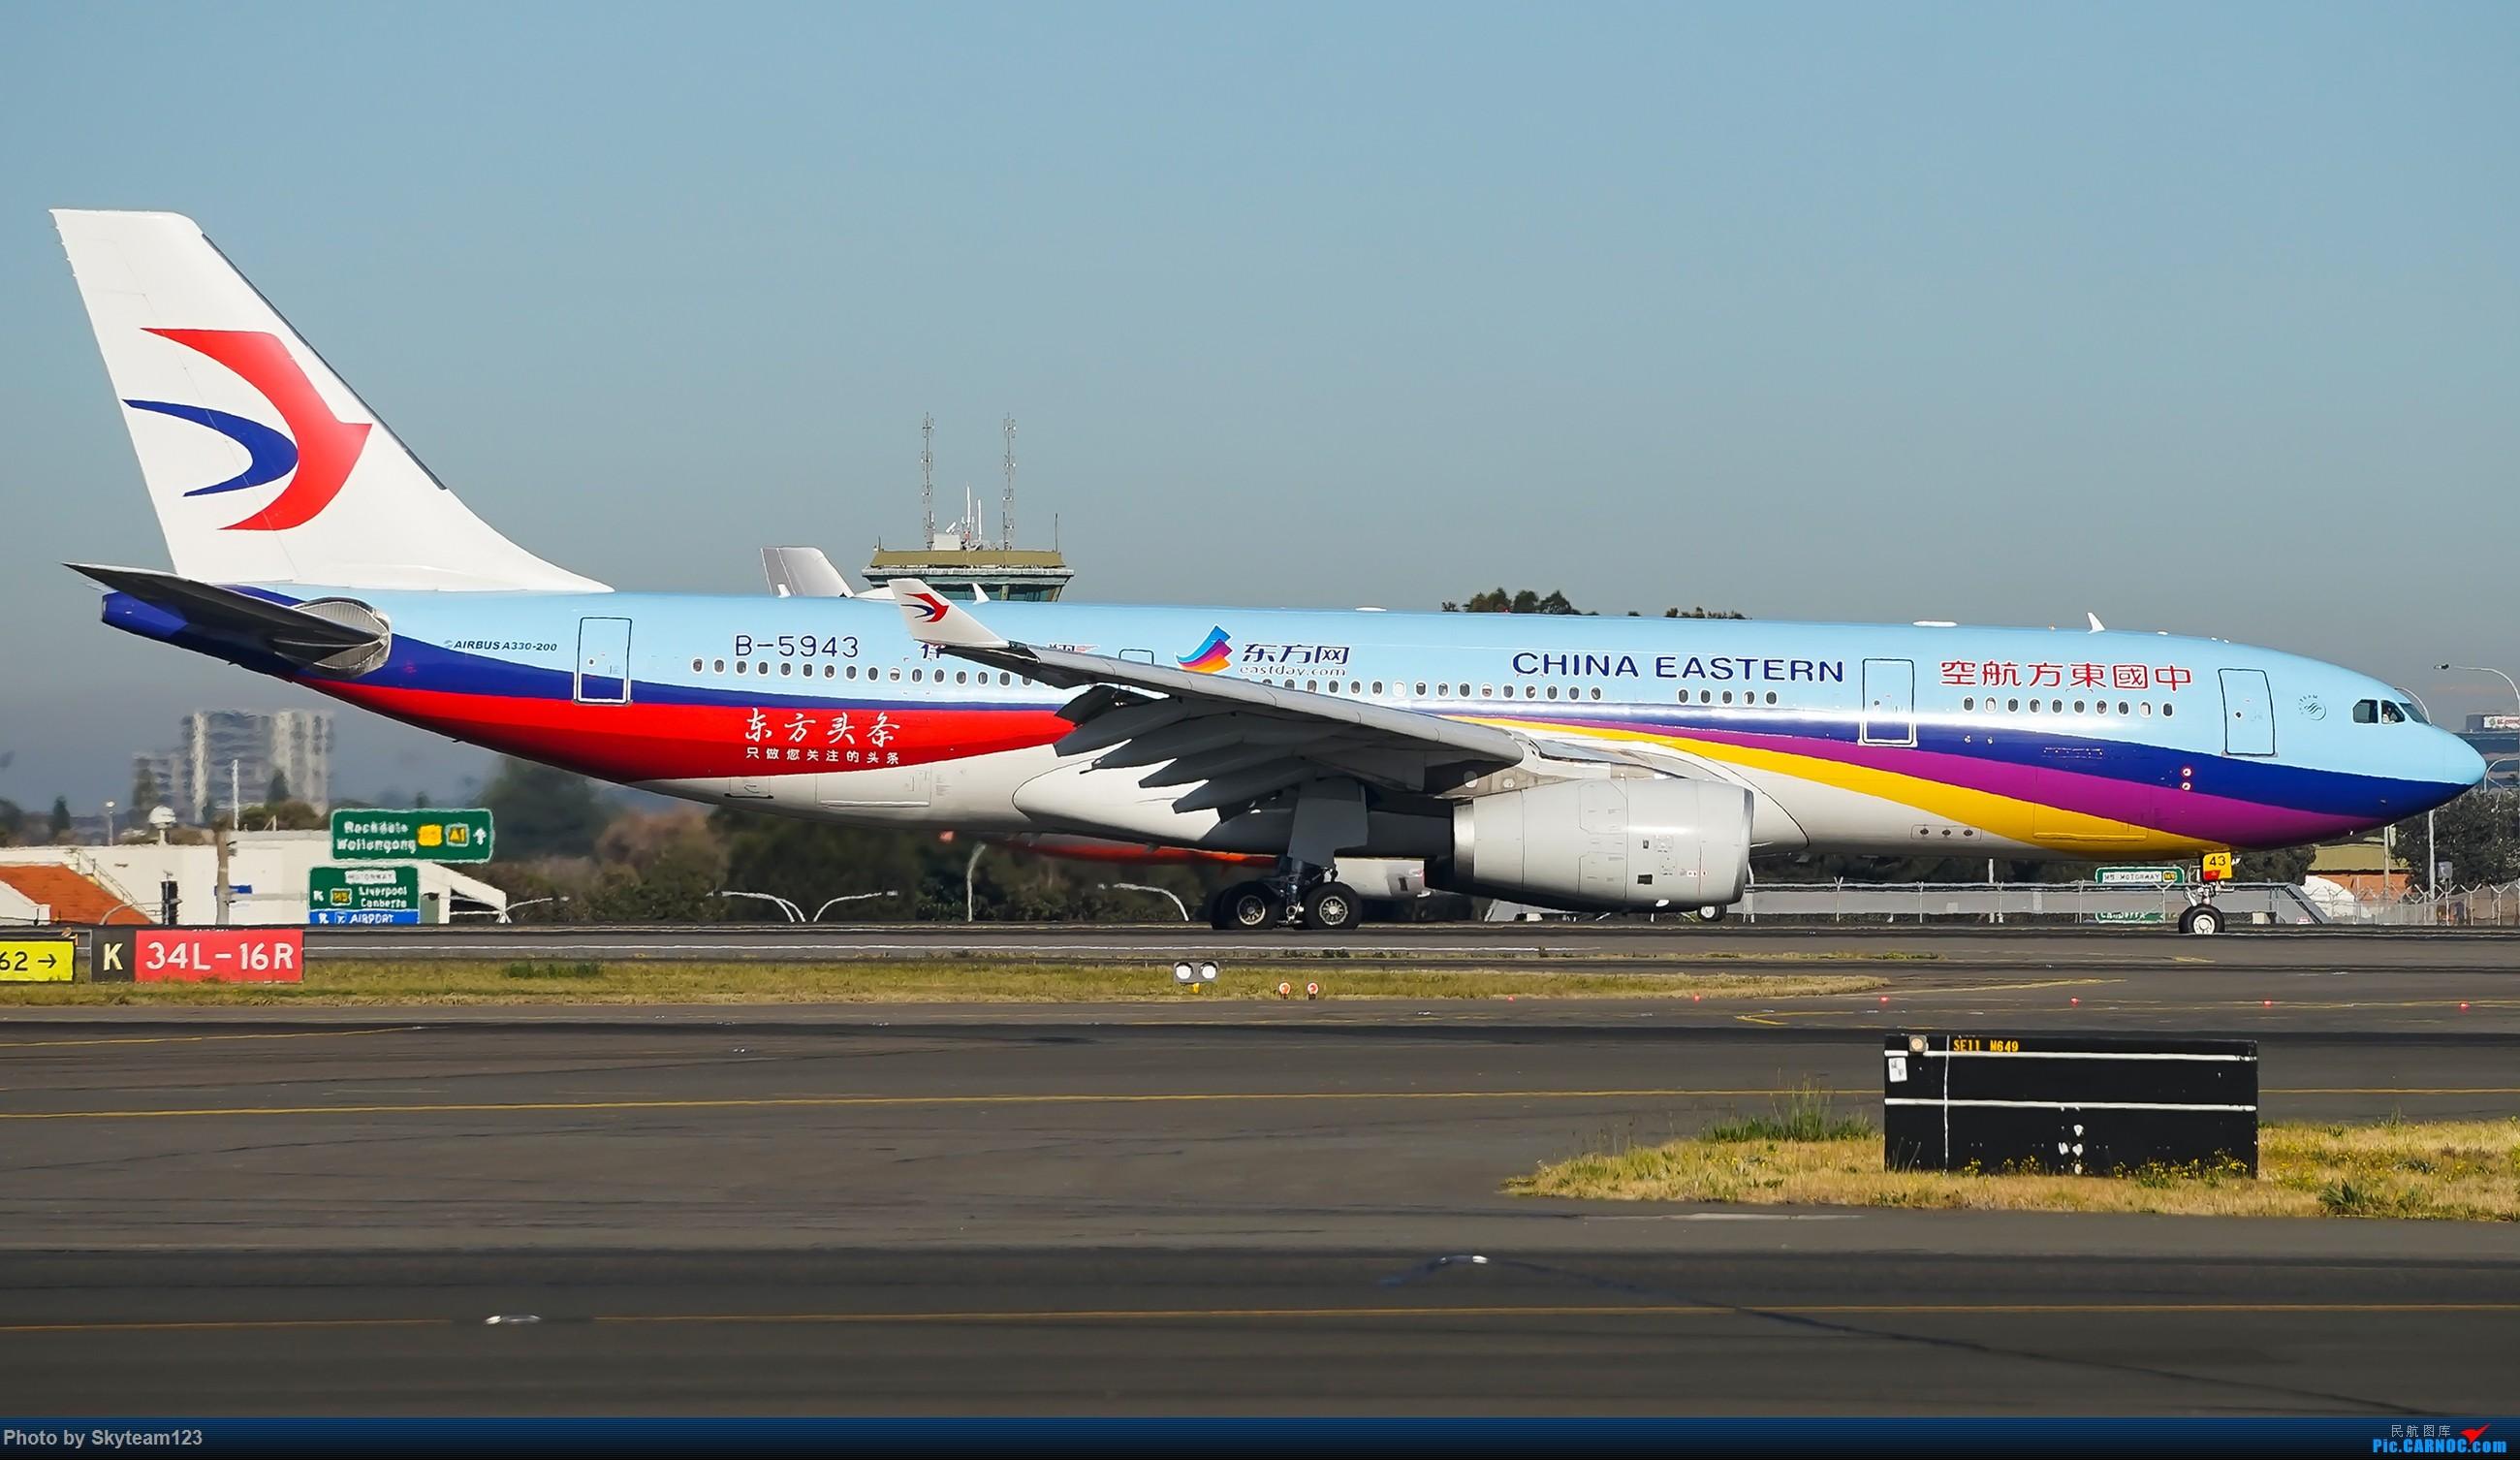 Re:[原创][SYD] 再访Blu EMU停车场 早上34L抵港出发杂图几张 AIRBUS A330-200 B-5943 澳大利亚悉尼金斯福德·史密斯机场